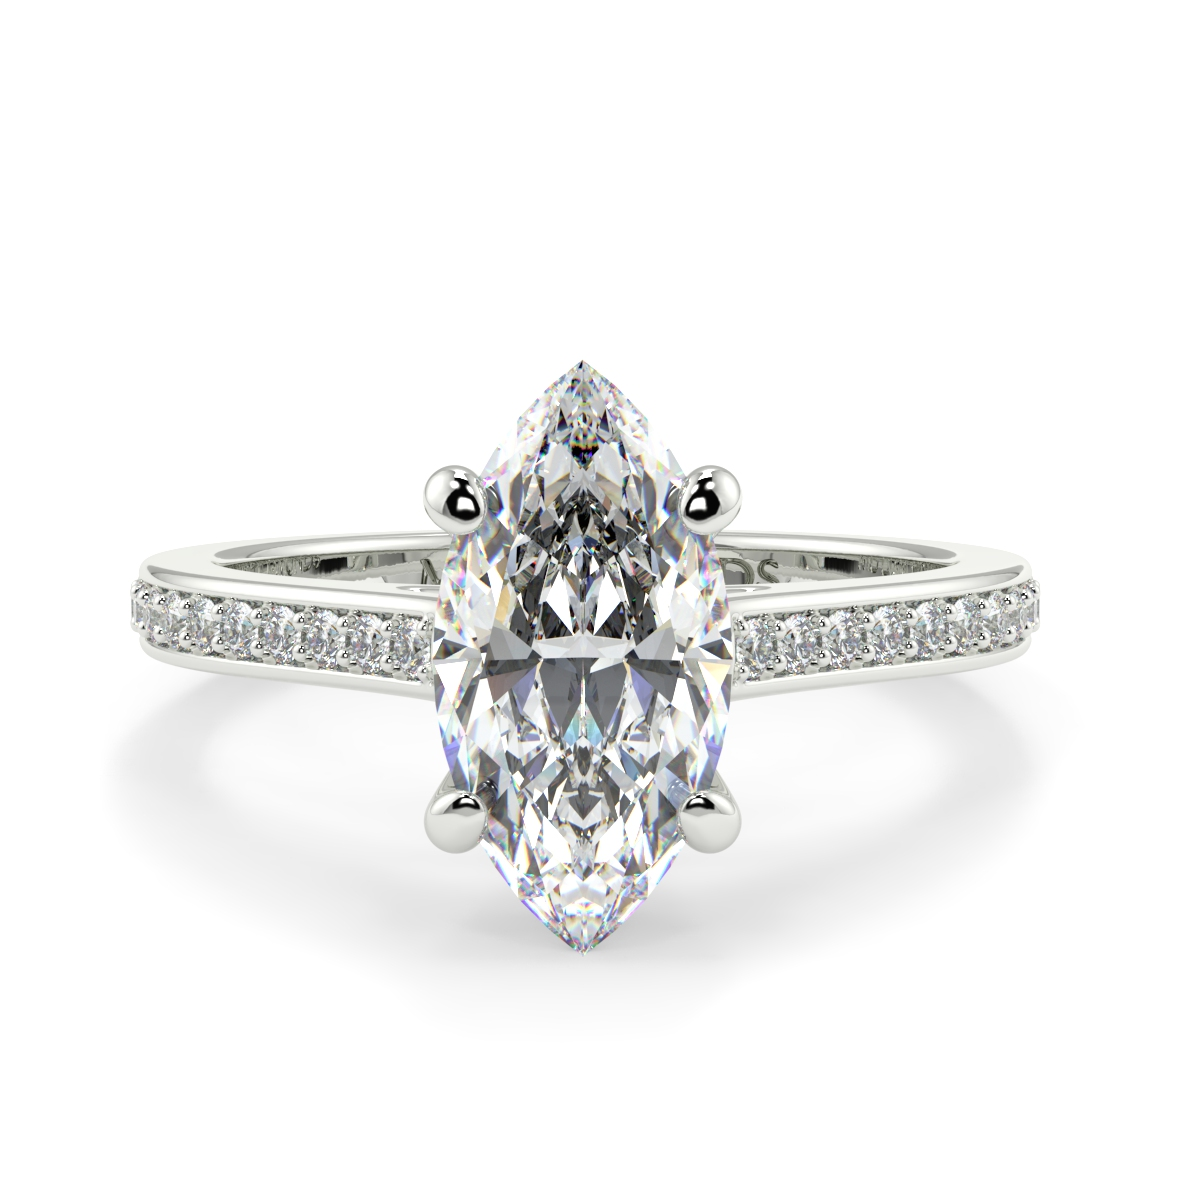 Marquise Pave Set Diamond Ring